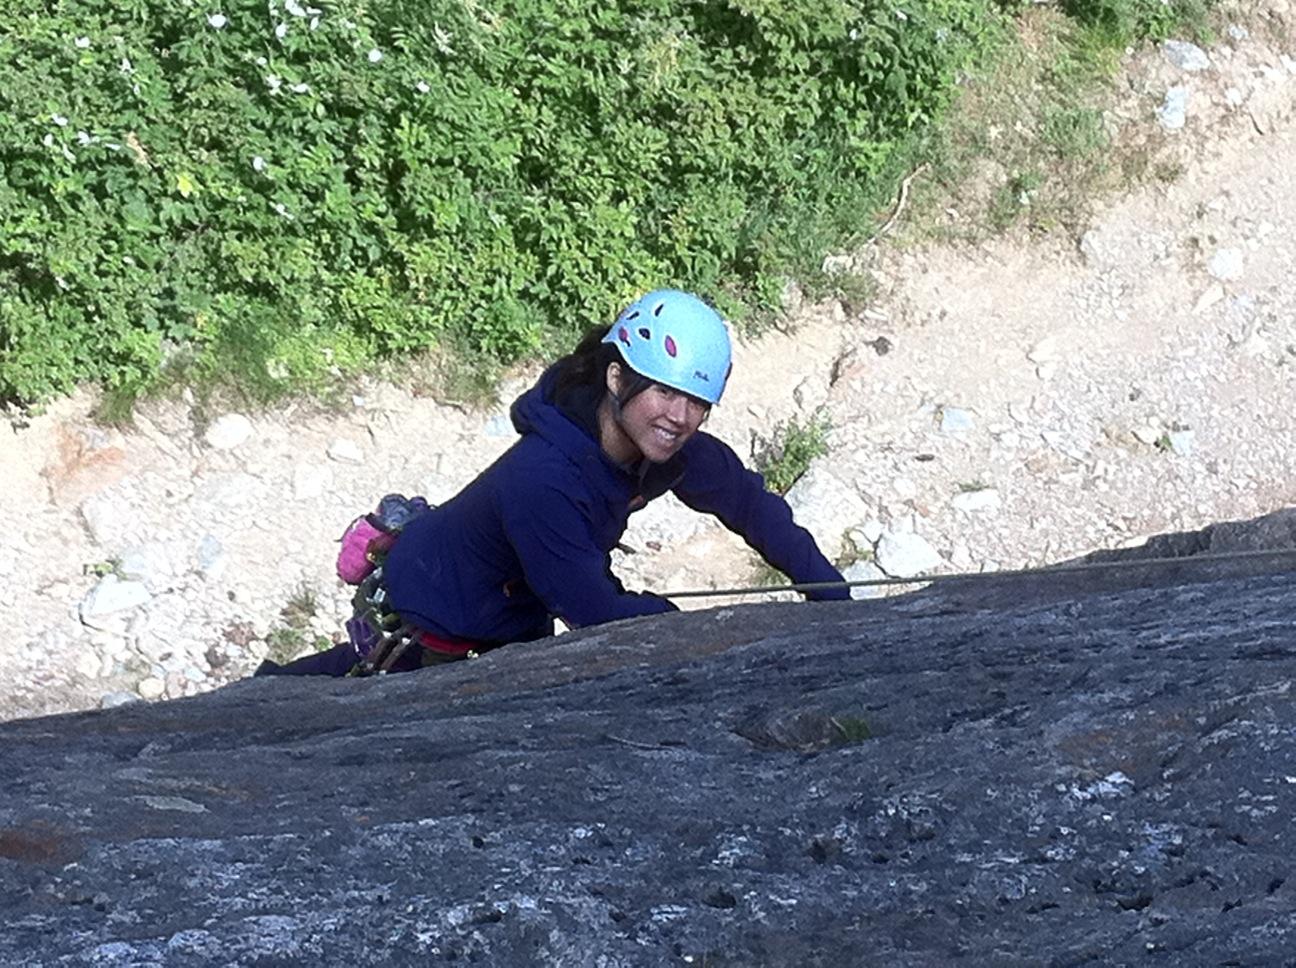 Chamonix Rock Climbing & Gran Paradiso Ascent